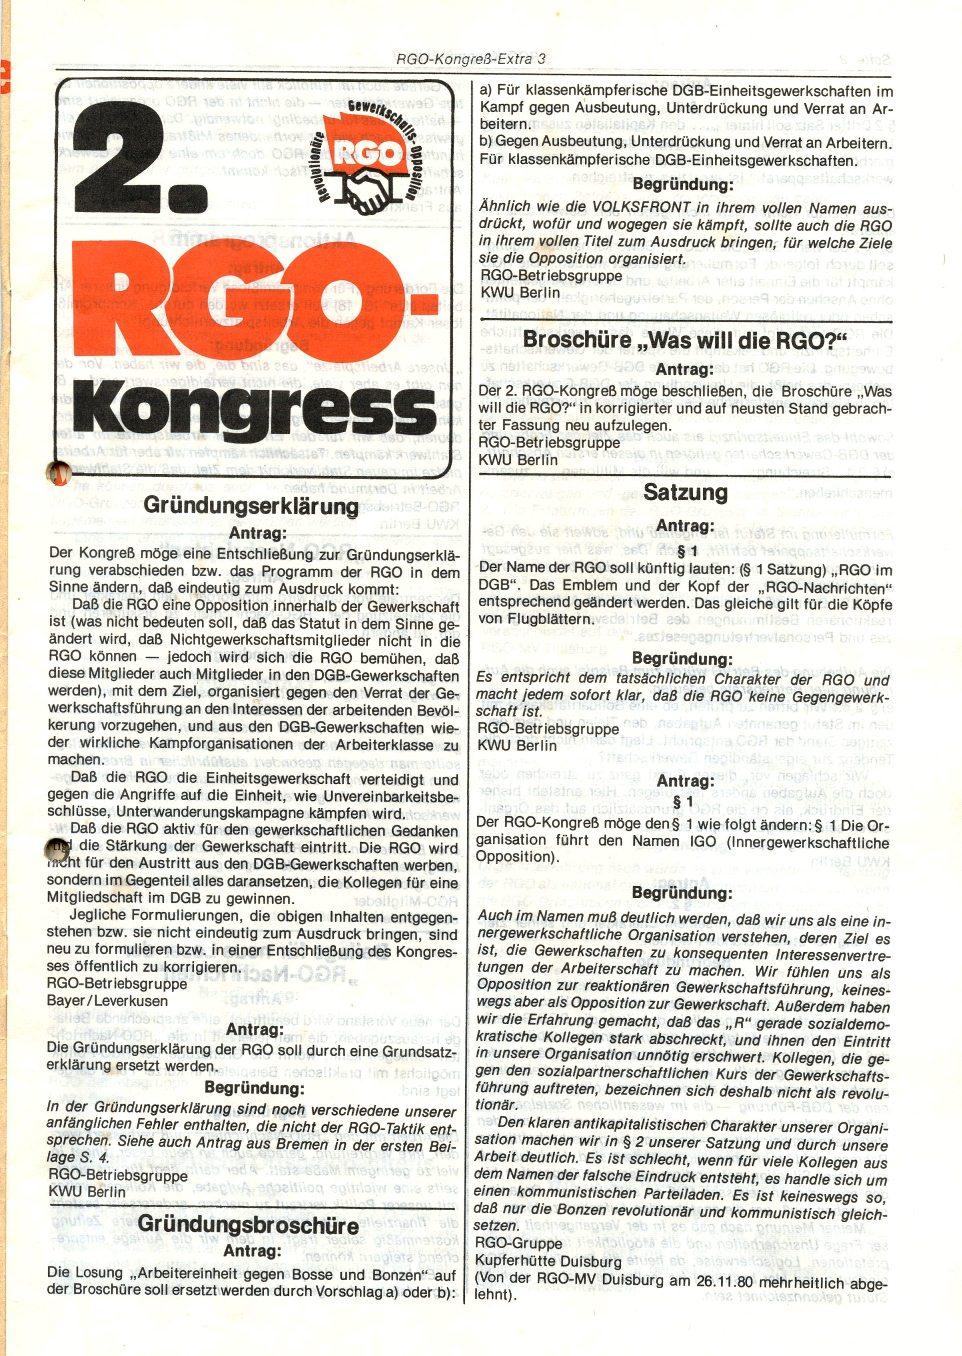 RGO_Kongress_Extra_1981_3_01